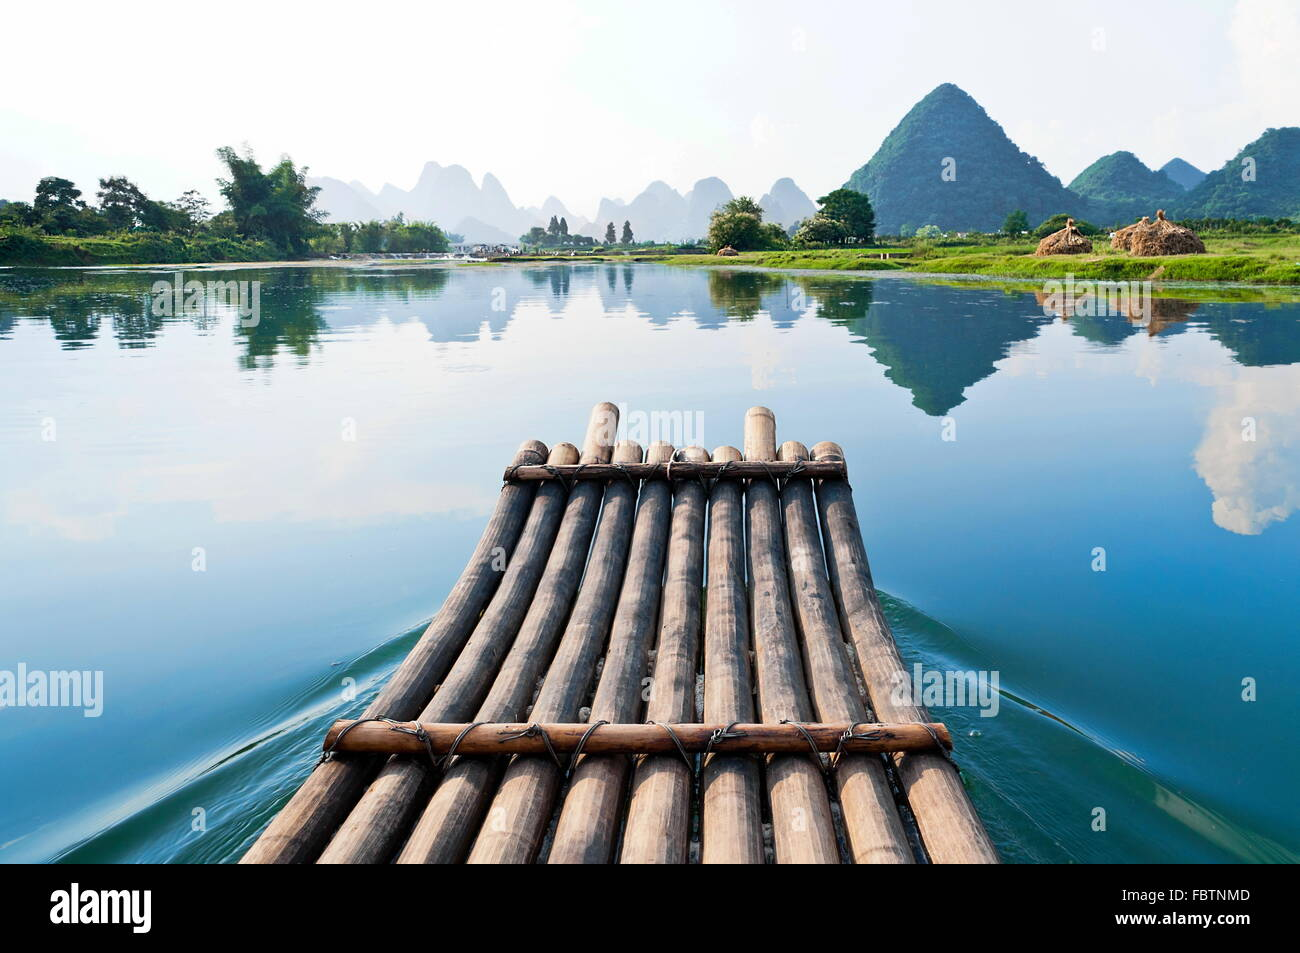 Il bambù rafting nel fiume Li Immagini Stock